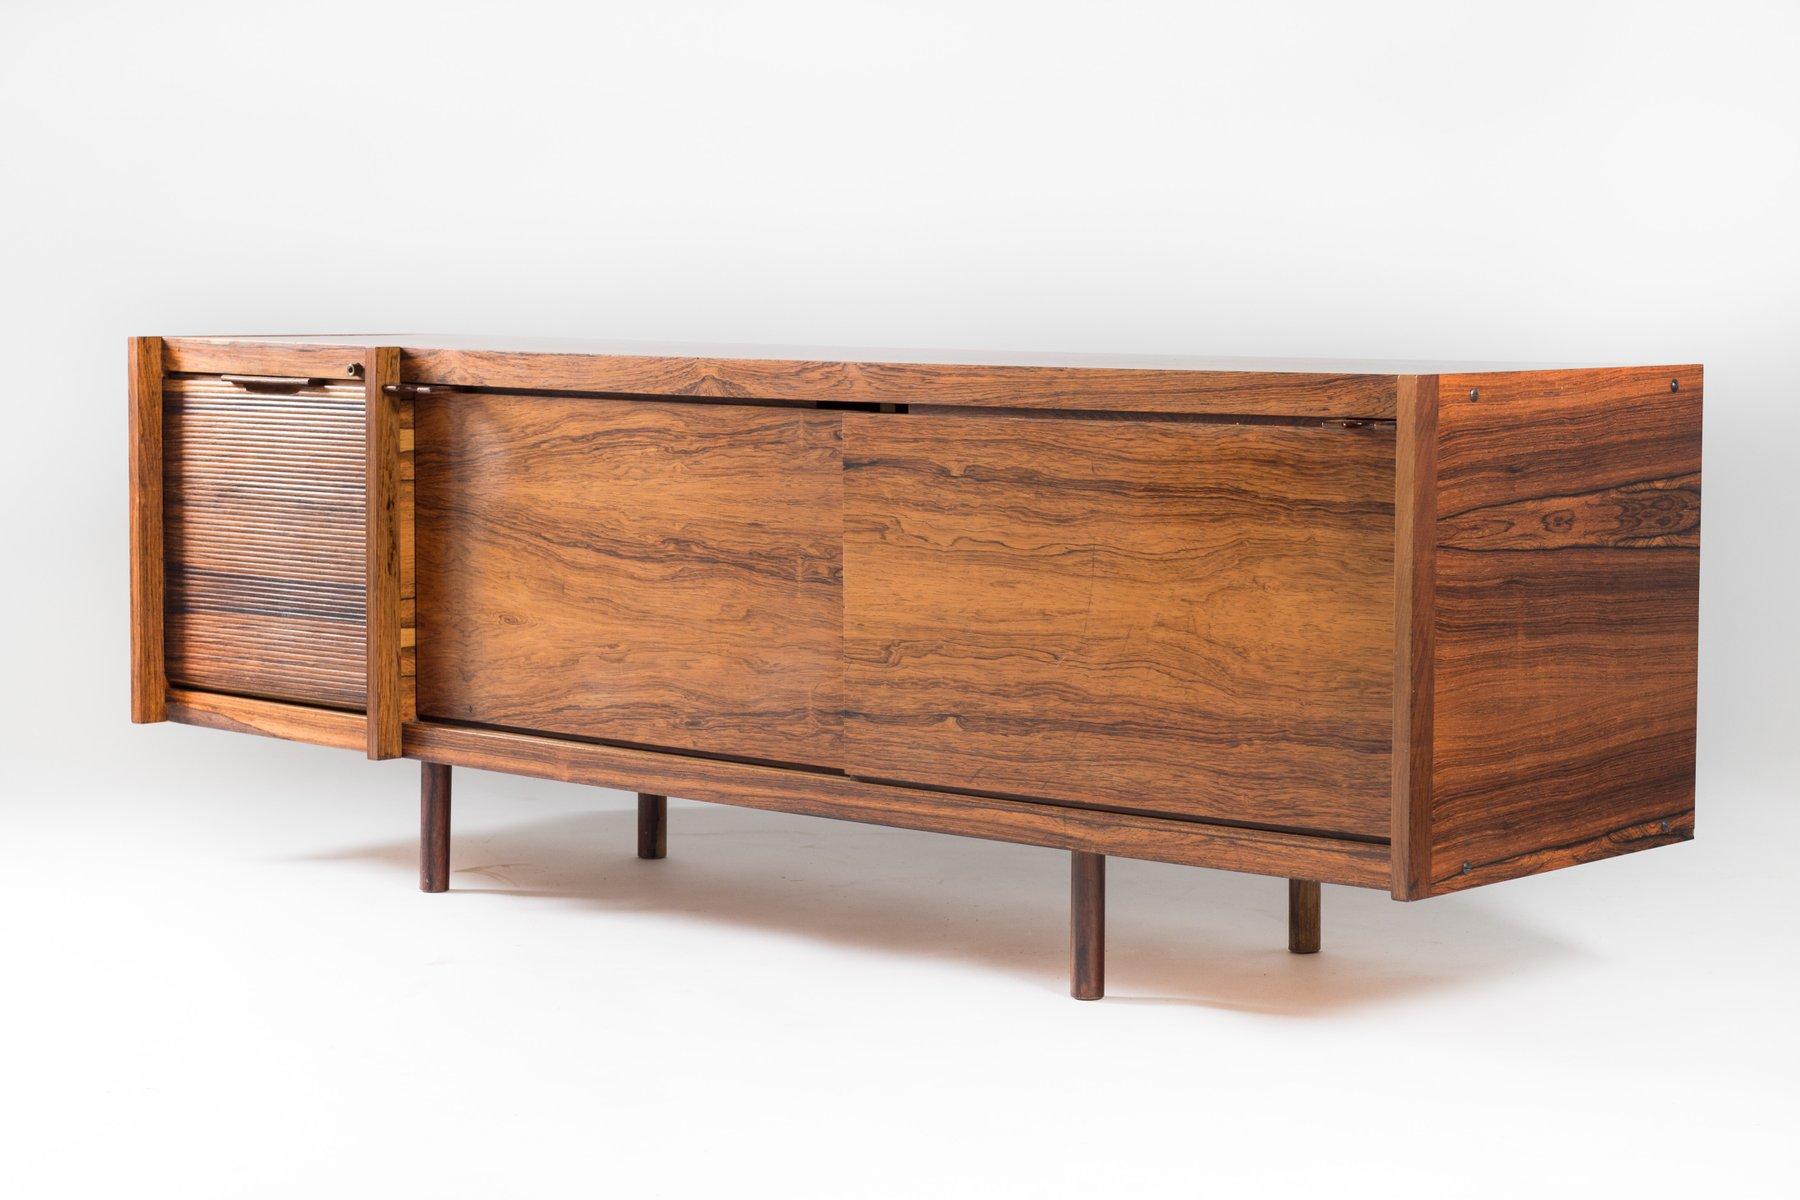 skandinavisches palisander sideboard von sven ivar dysthe f r dokka m bler 1960er bei pamono kaufen. Black Bedroom Furniture Sets. Home Design Ideas